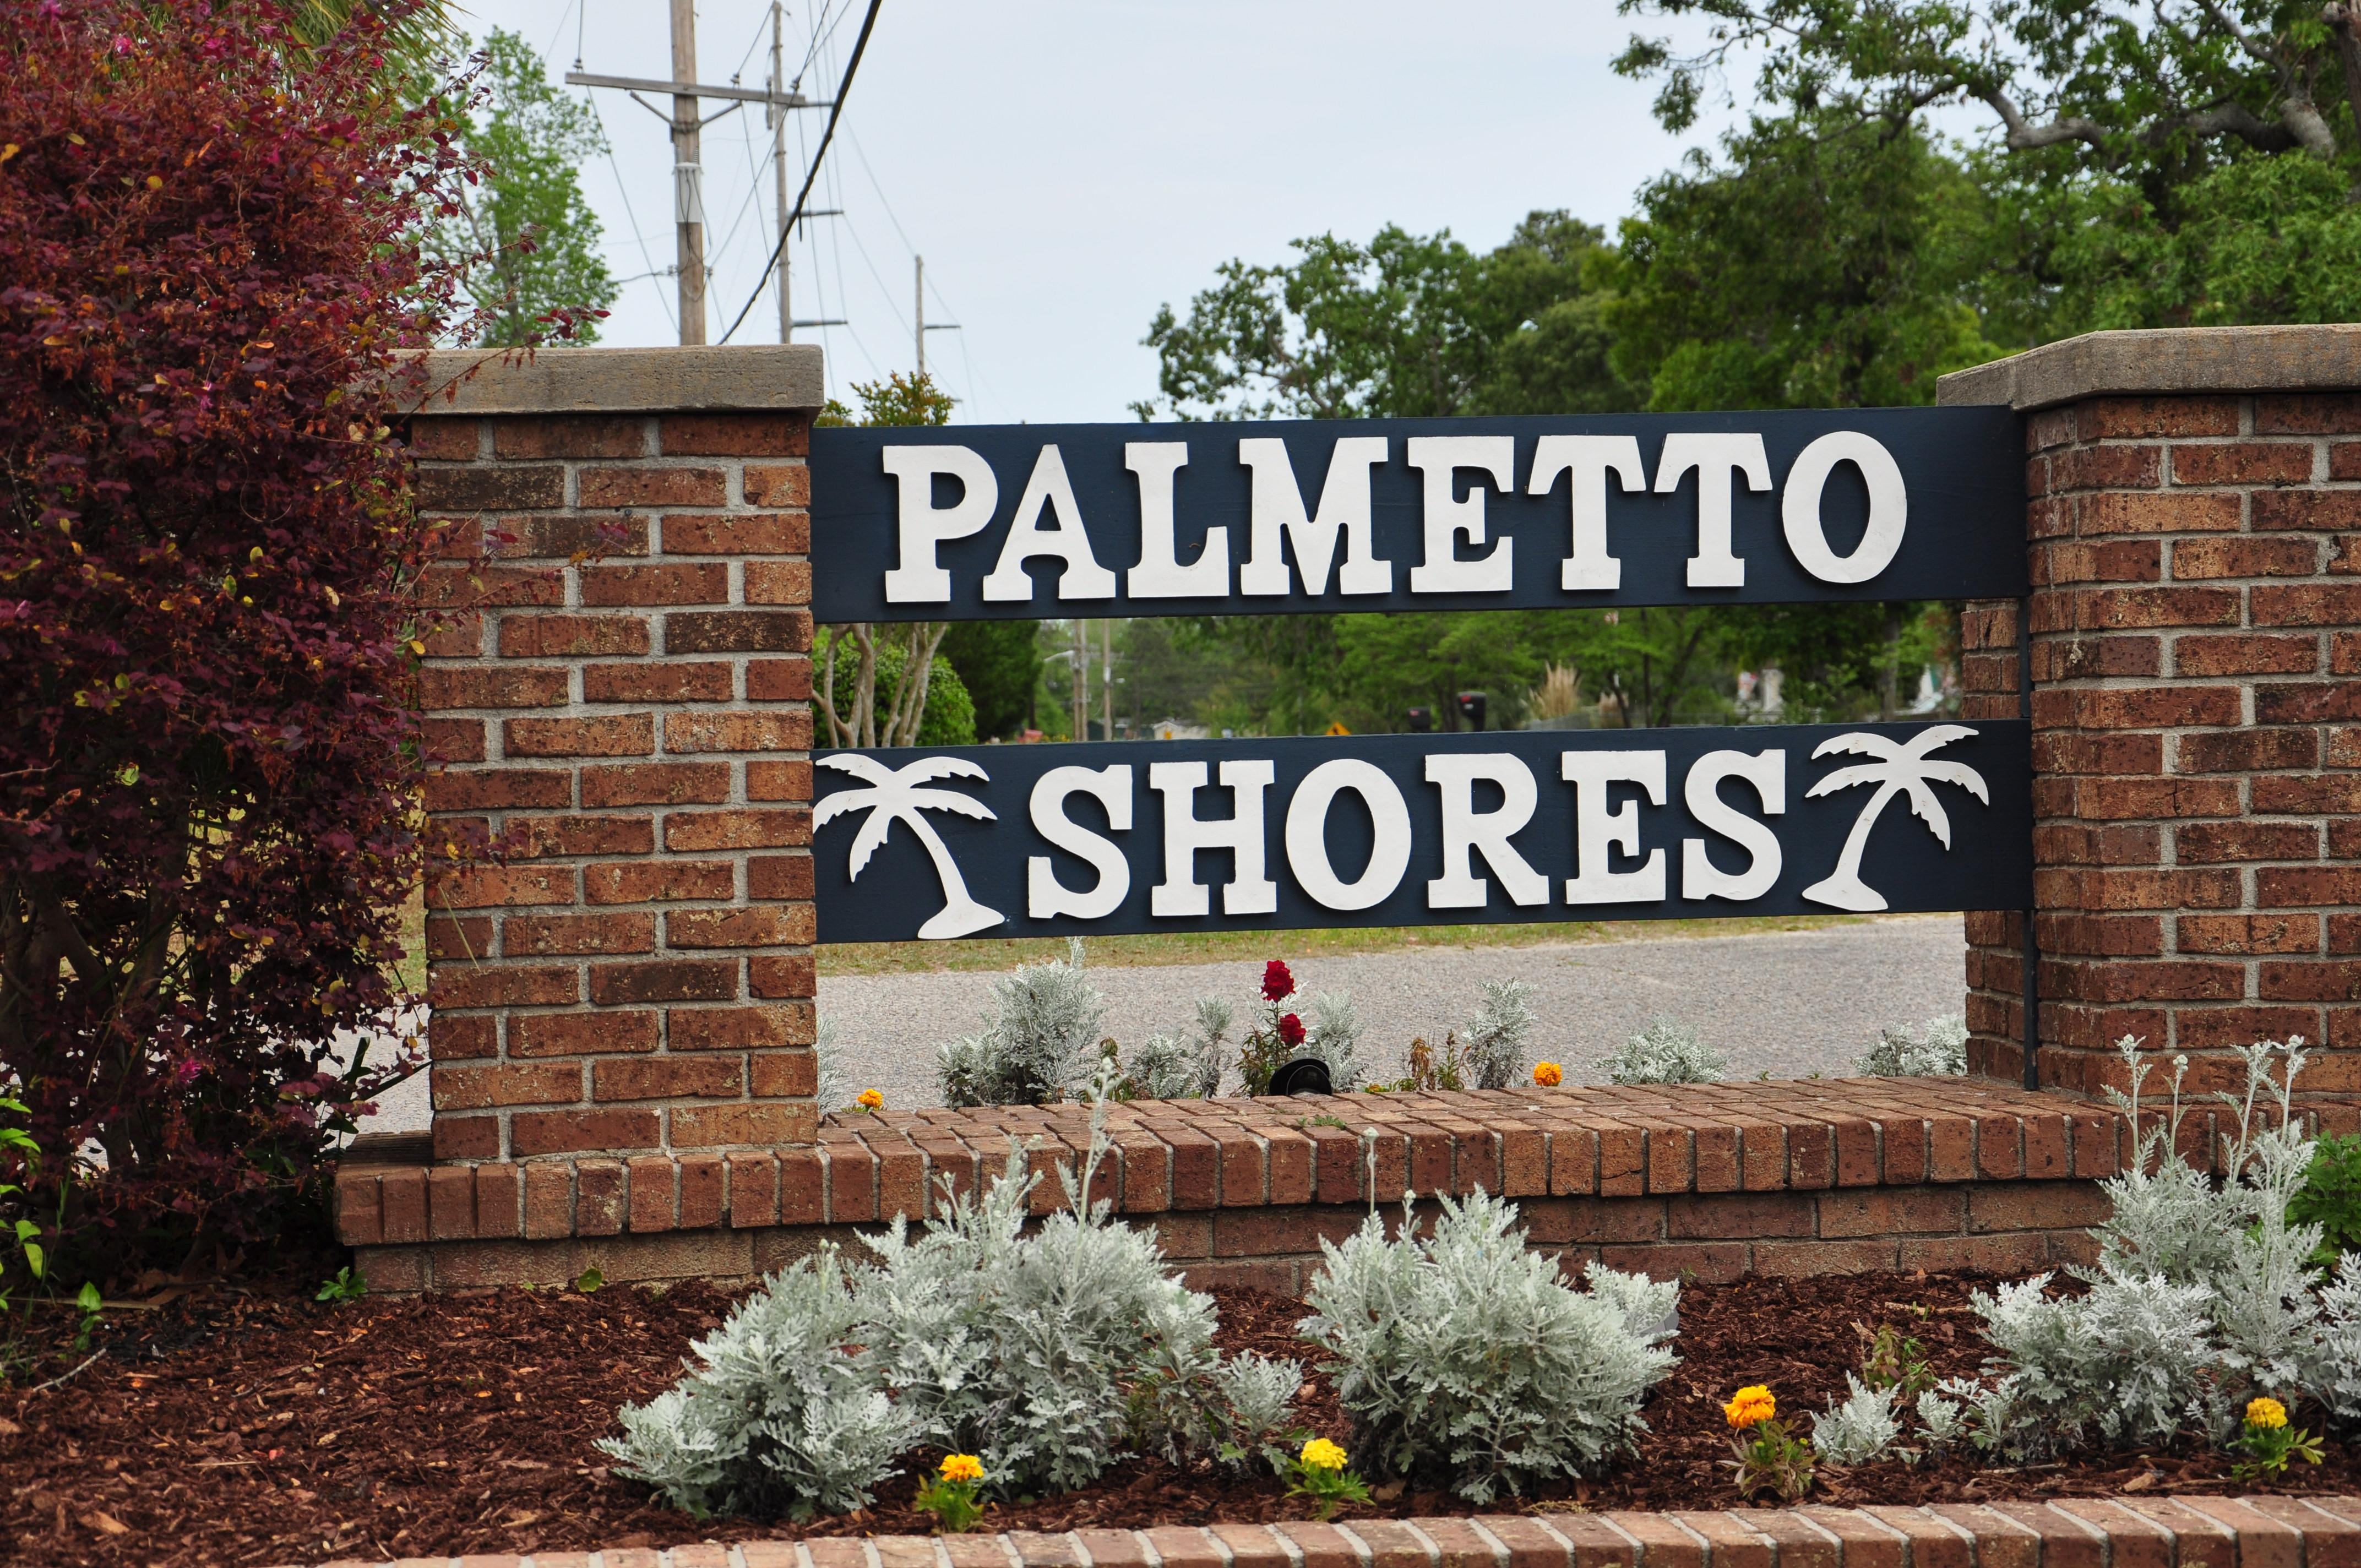 Palmetto Shores